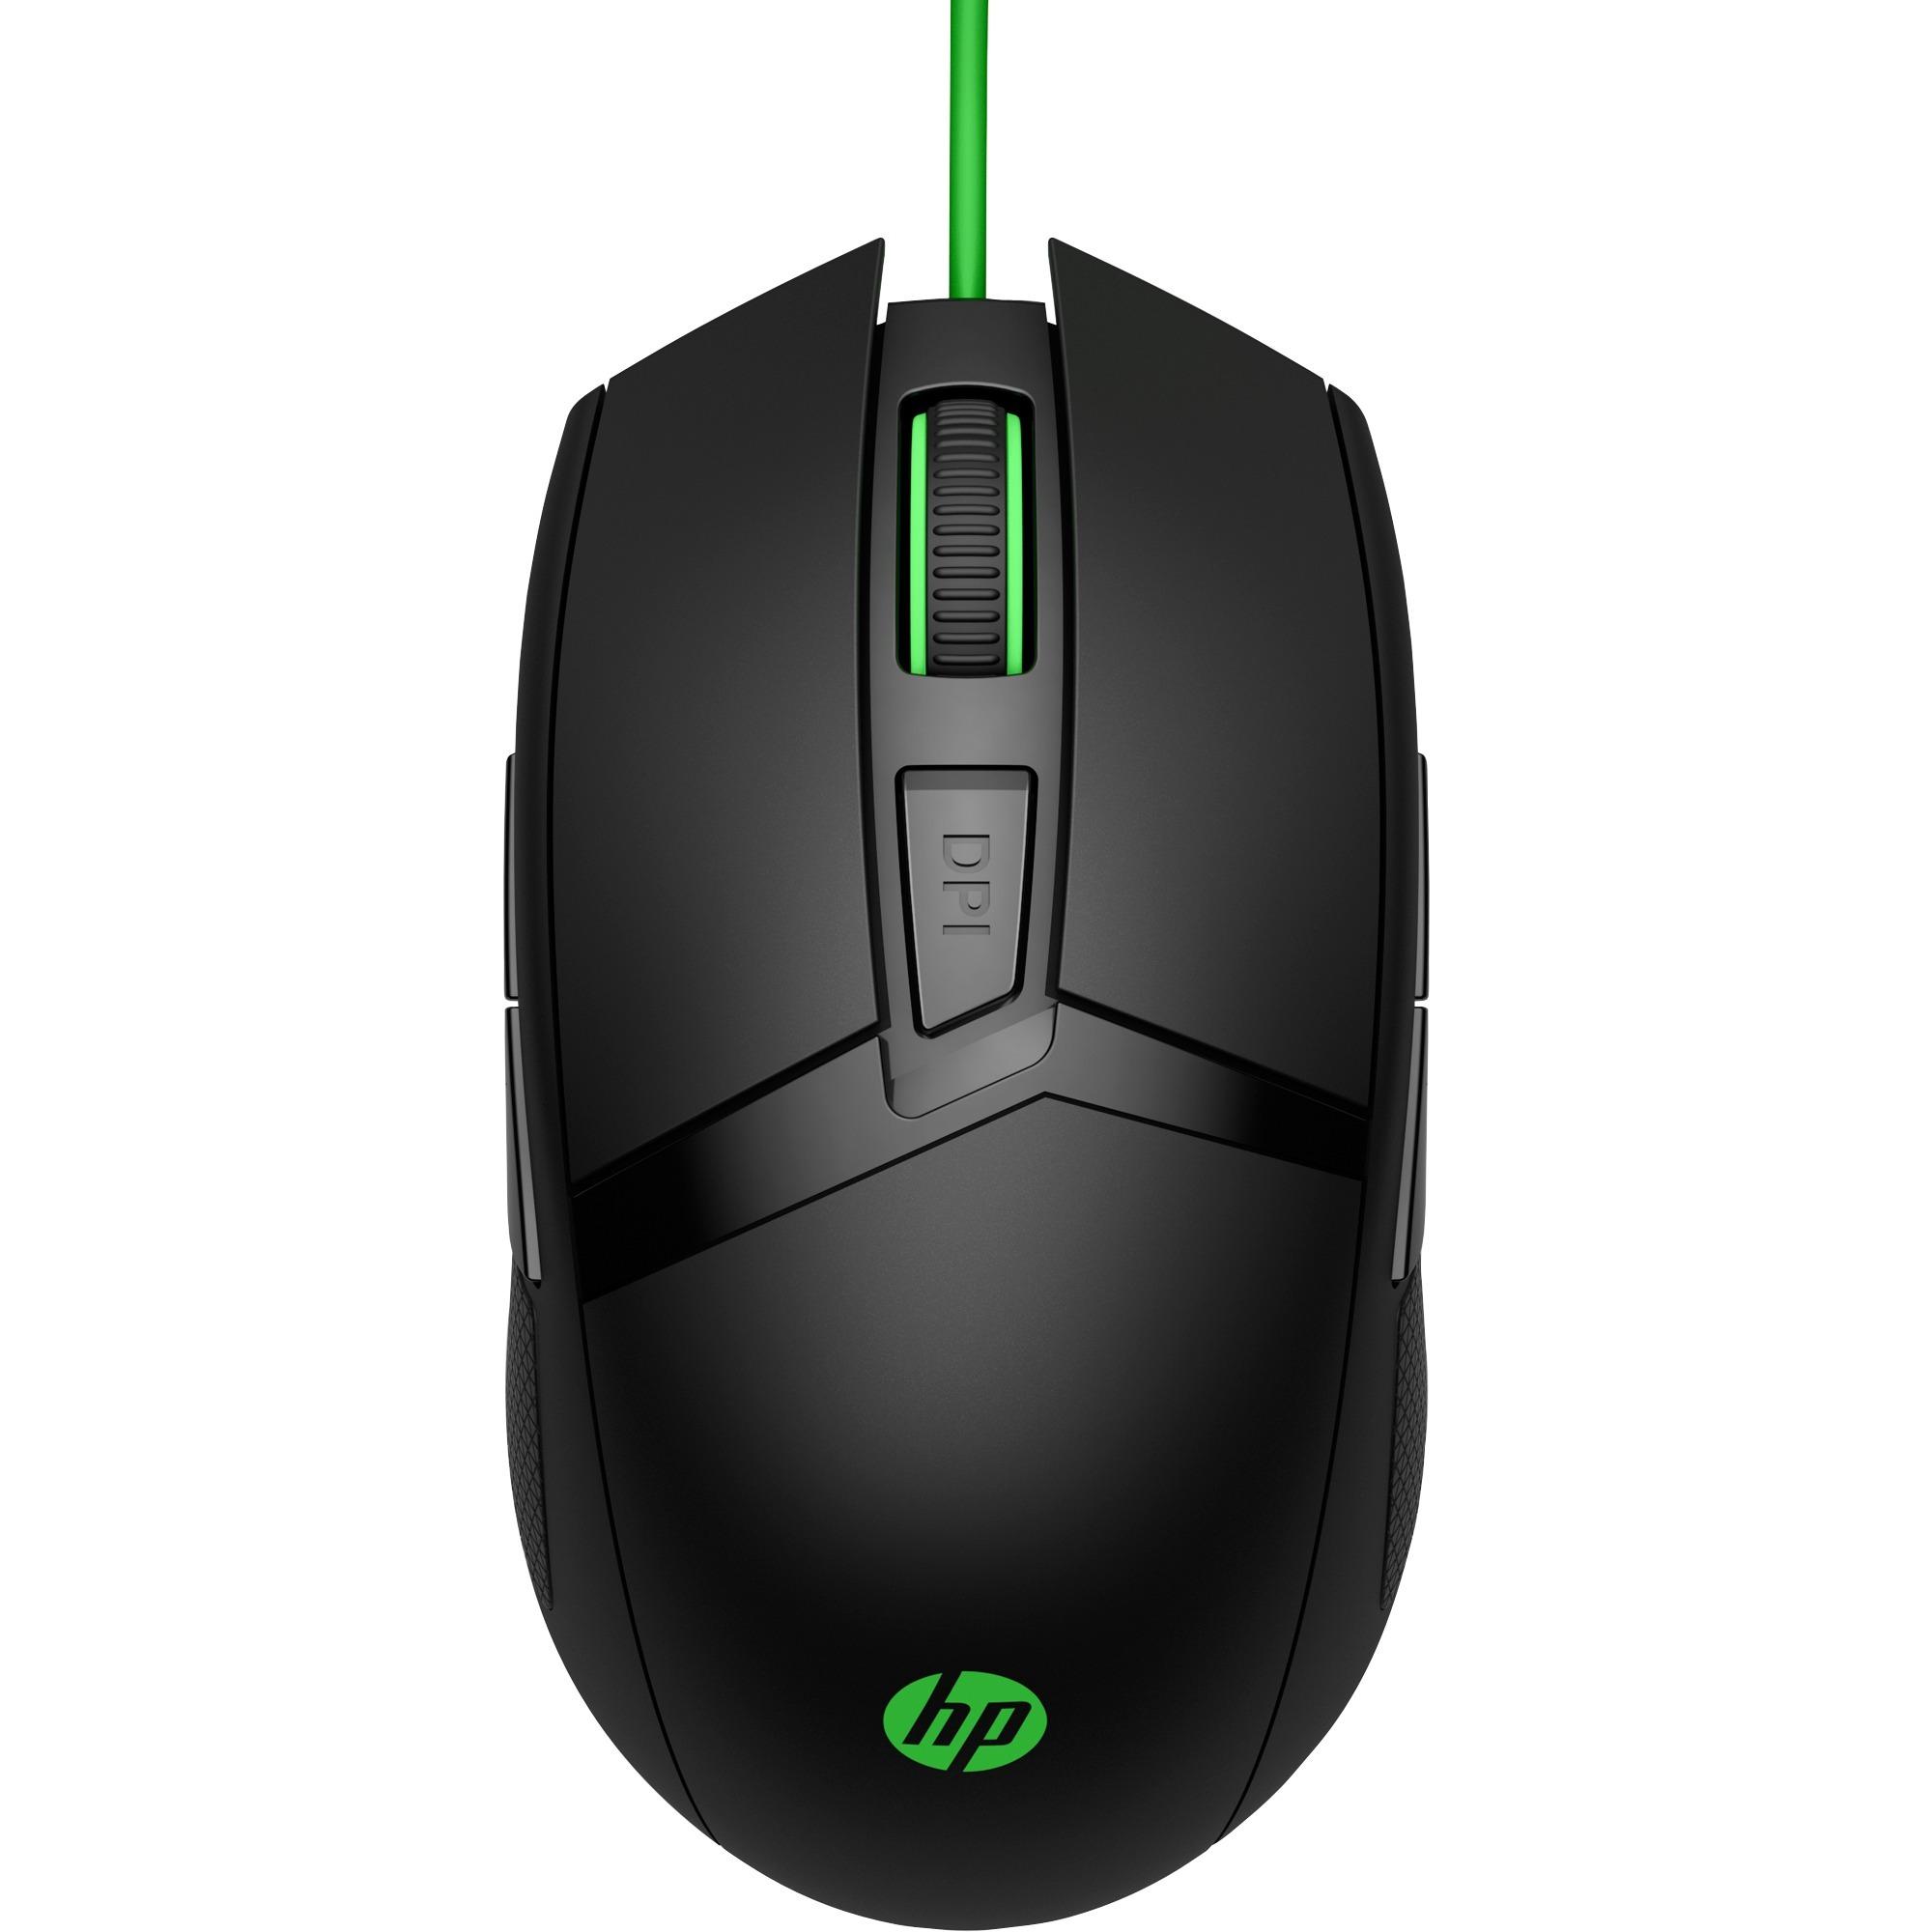 300 ratón USB Óptico 5000 DPI Ambidextro Negro, Verde